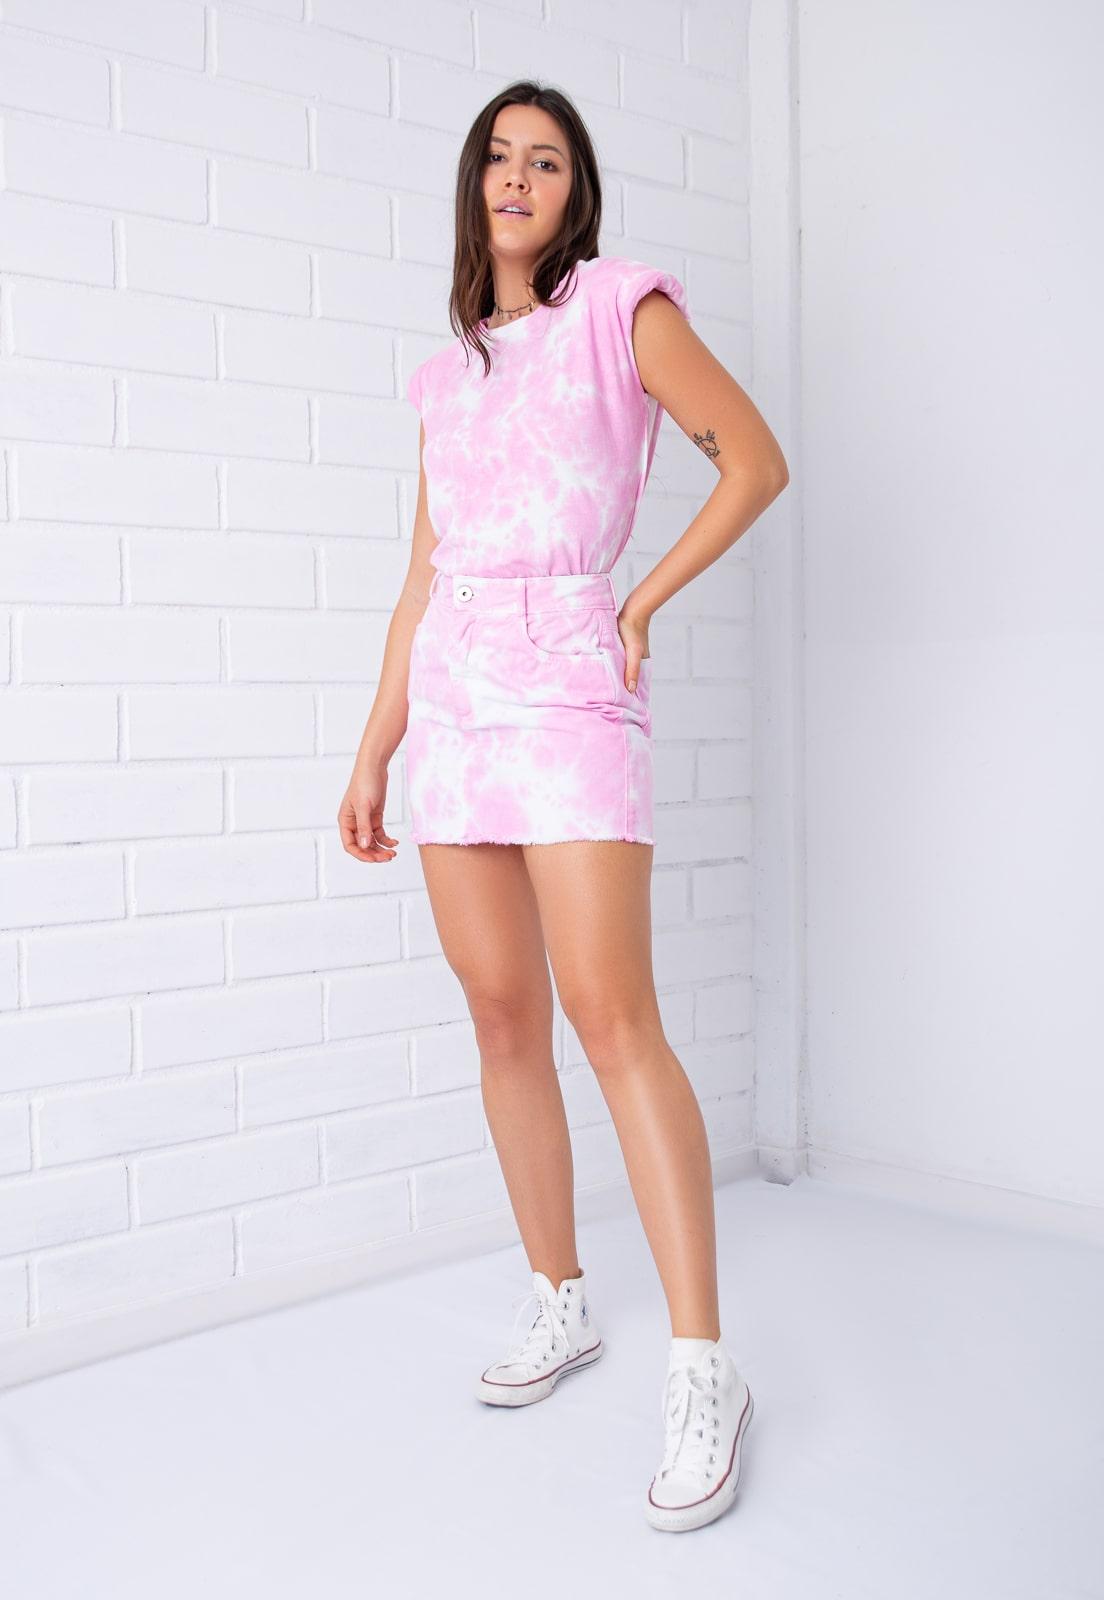 Blusa Regata Pkd  Muscle Tee Tie Dye Rosa